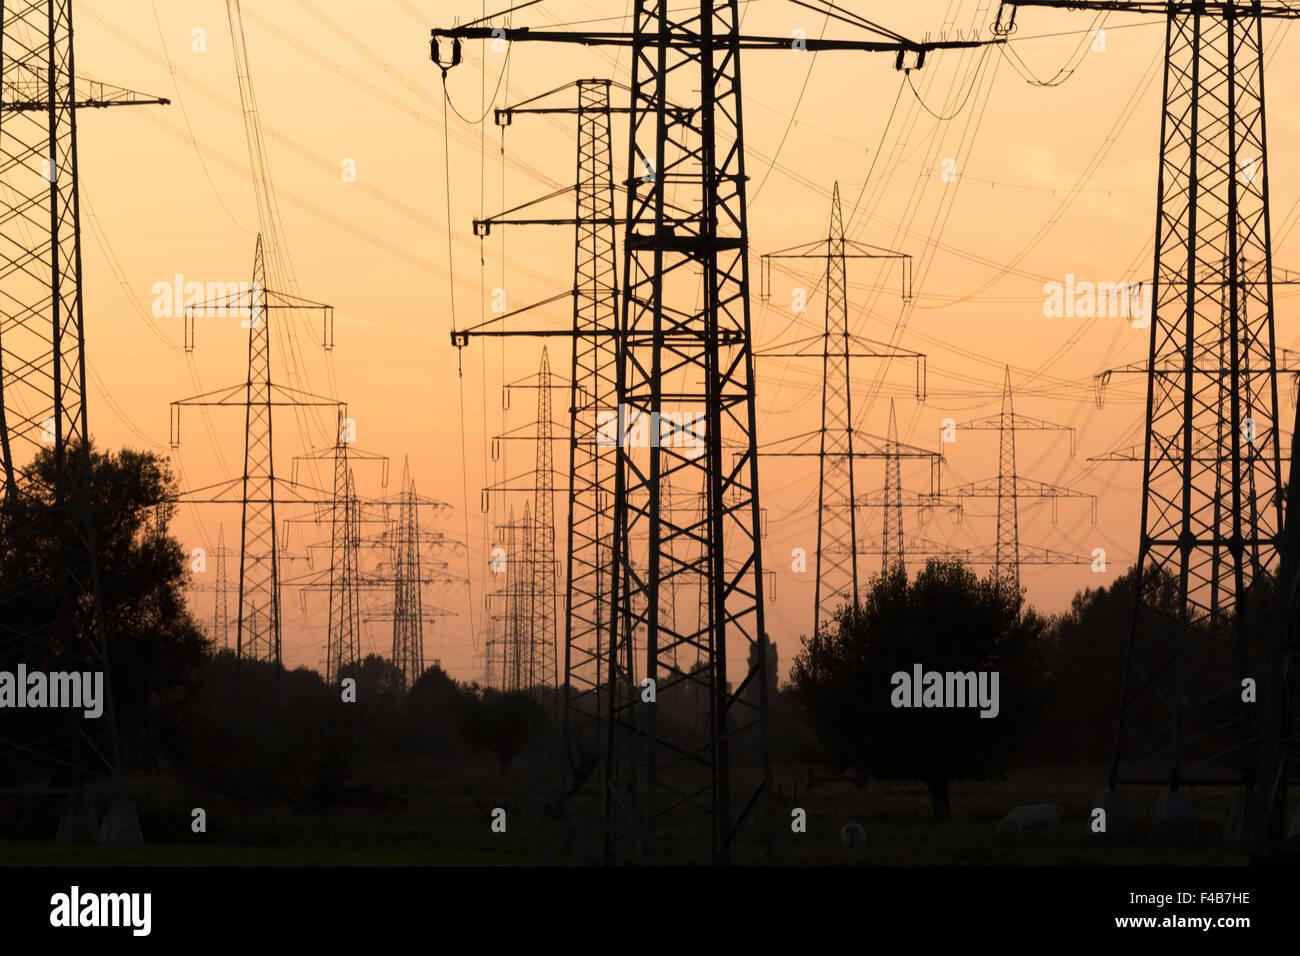 Overhead cables in a sundown landscape 4 - Stock Image